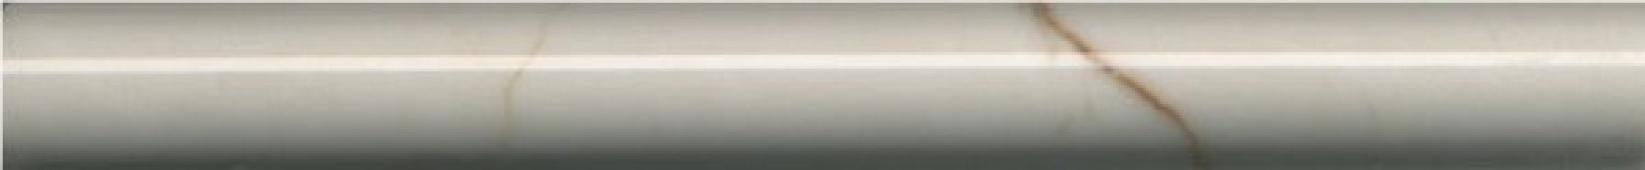 SPB006R Театро бежевый светлый обрезной 25*2.5 бордюр